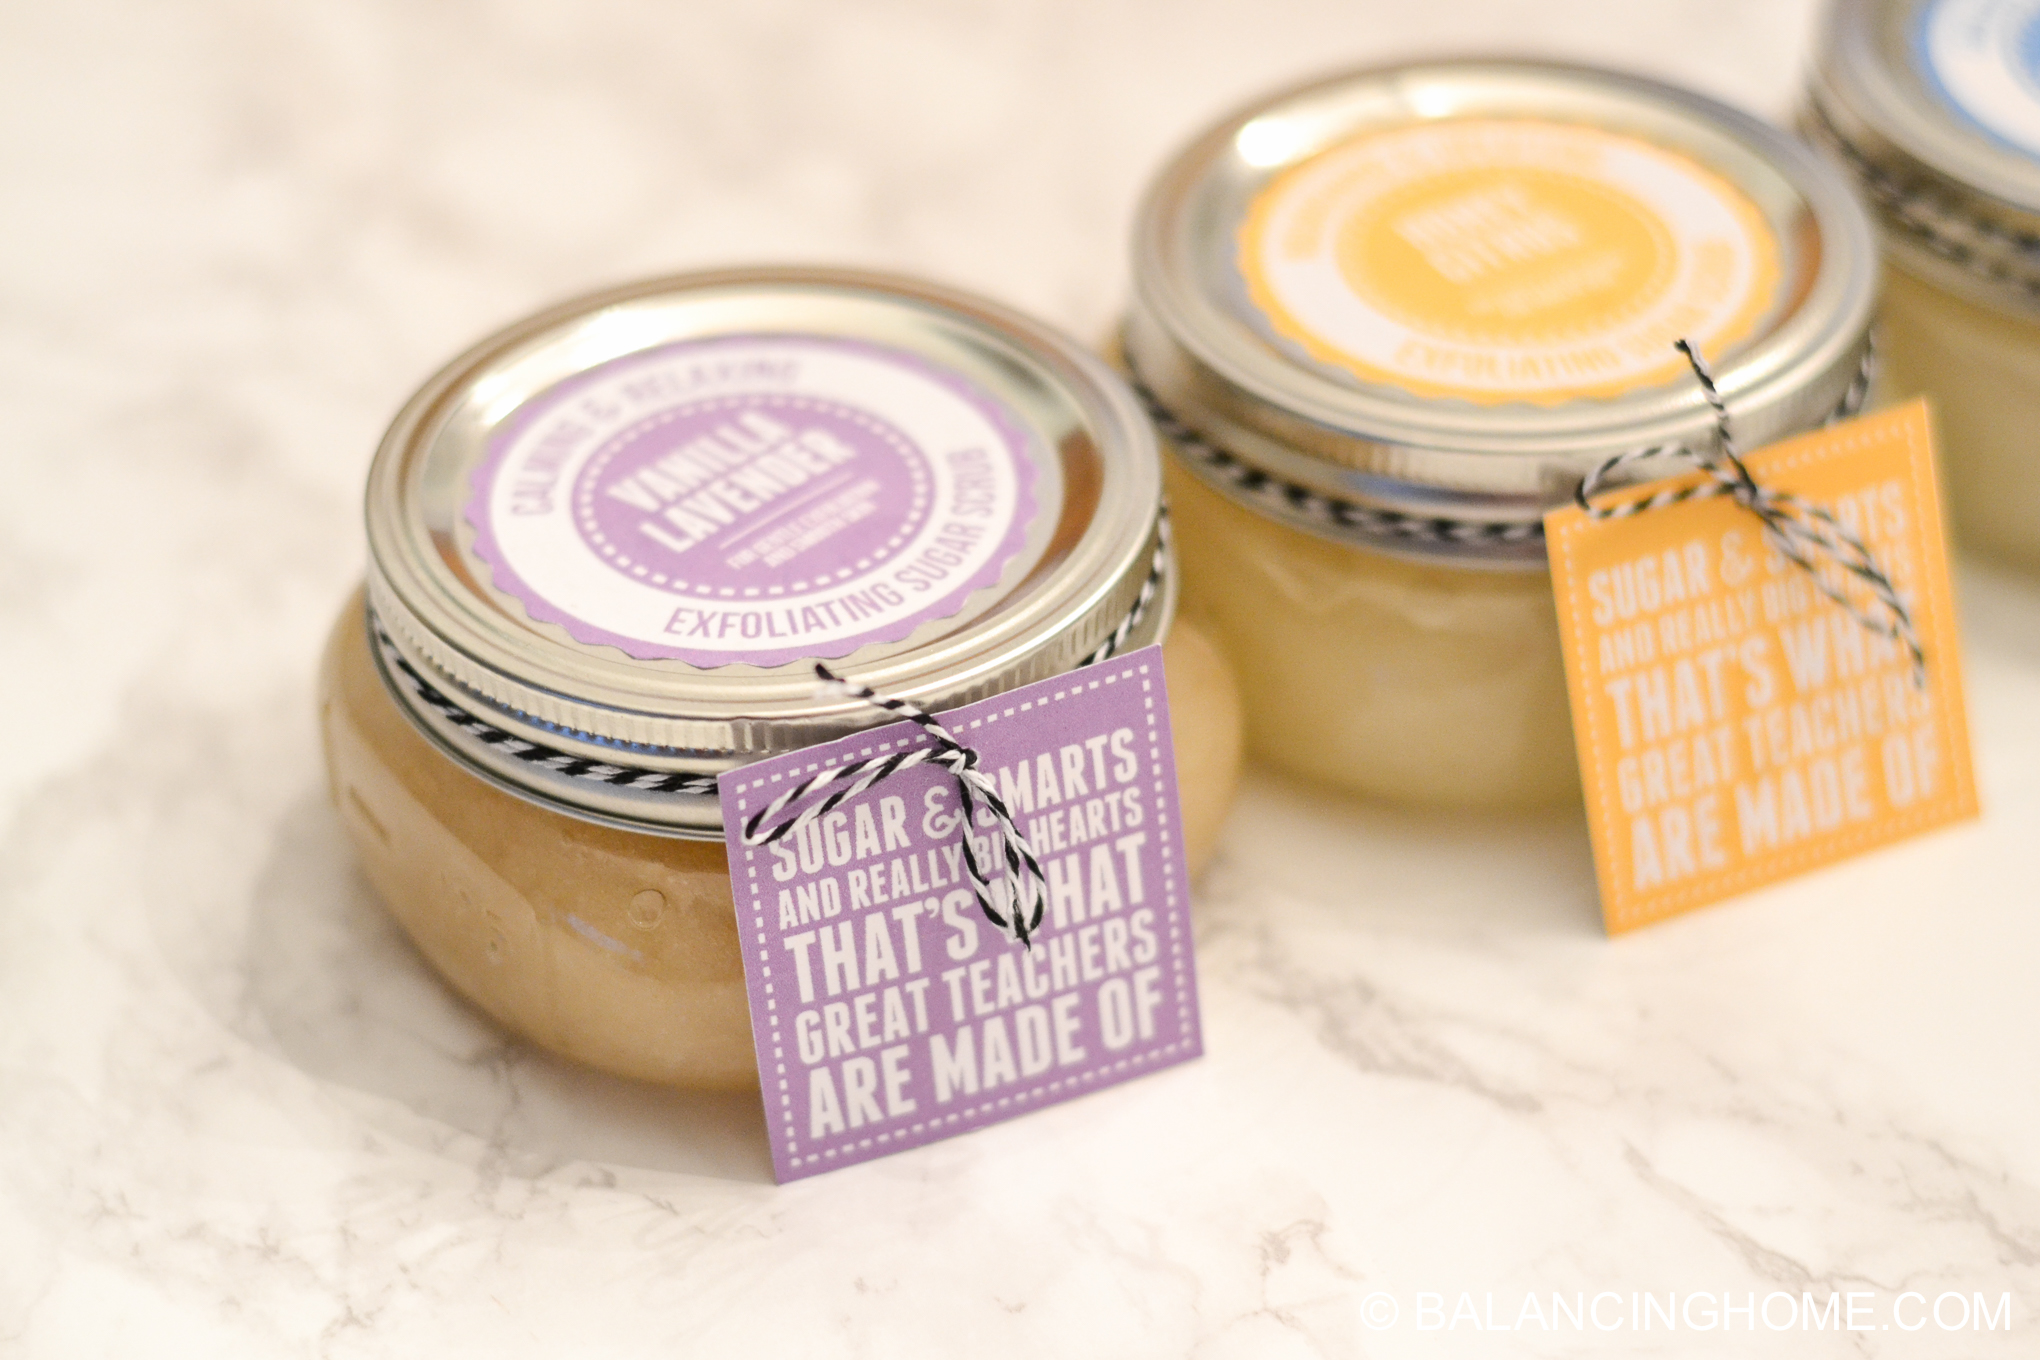 sugar-scrub-recipes-printable-labels-teacher-gift-tag-12